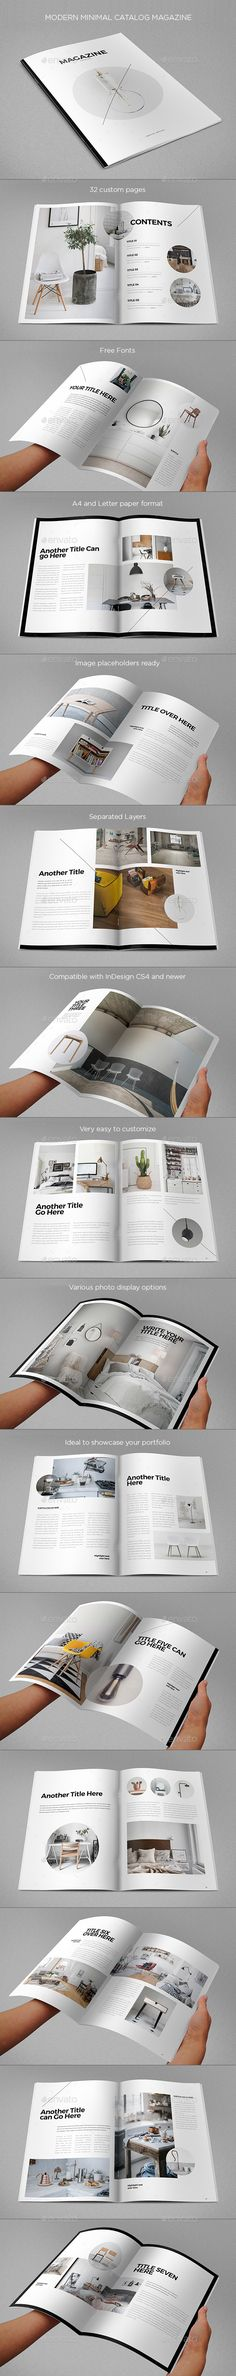 Simple Minimal Catalog Magazine Design Template - Magazines Print Templates InDesign INDD. Download here: https://graphicriver.net/item/simple-minimal-catalog-magazine/17707489?ref=yinkira